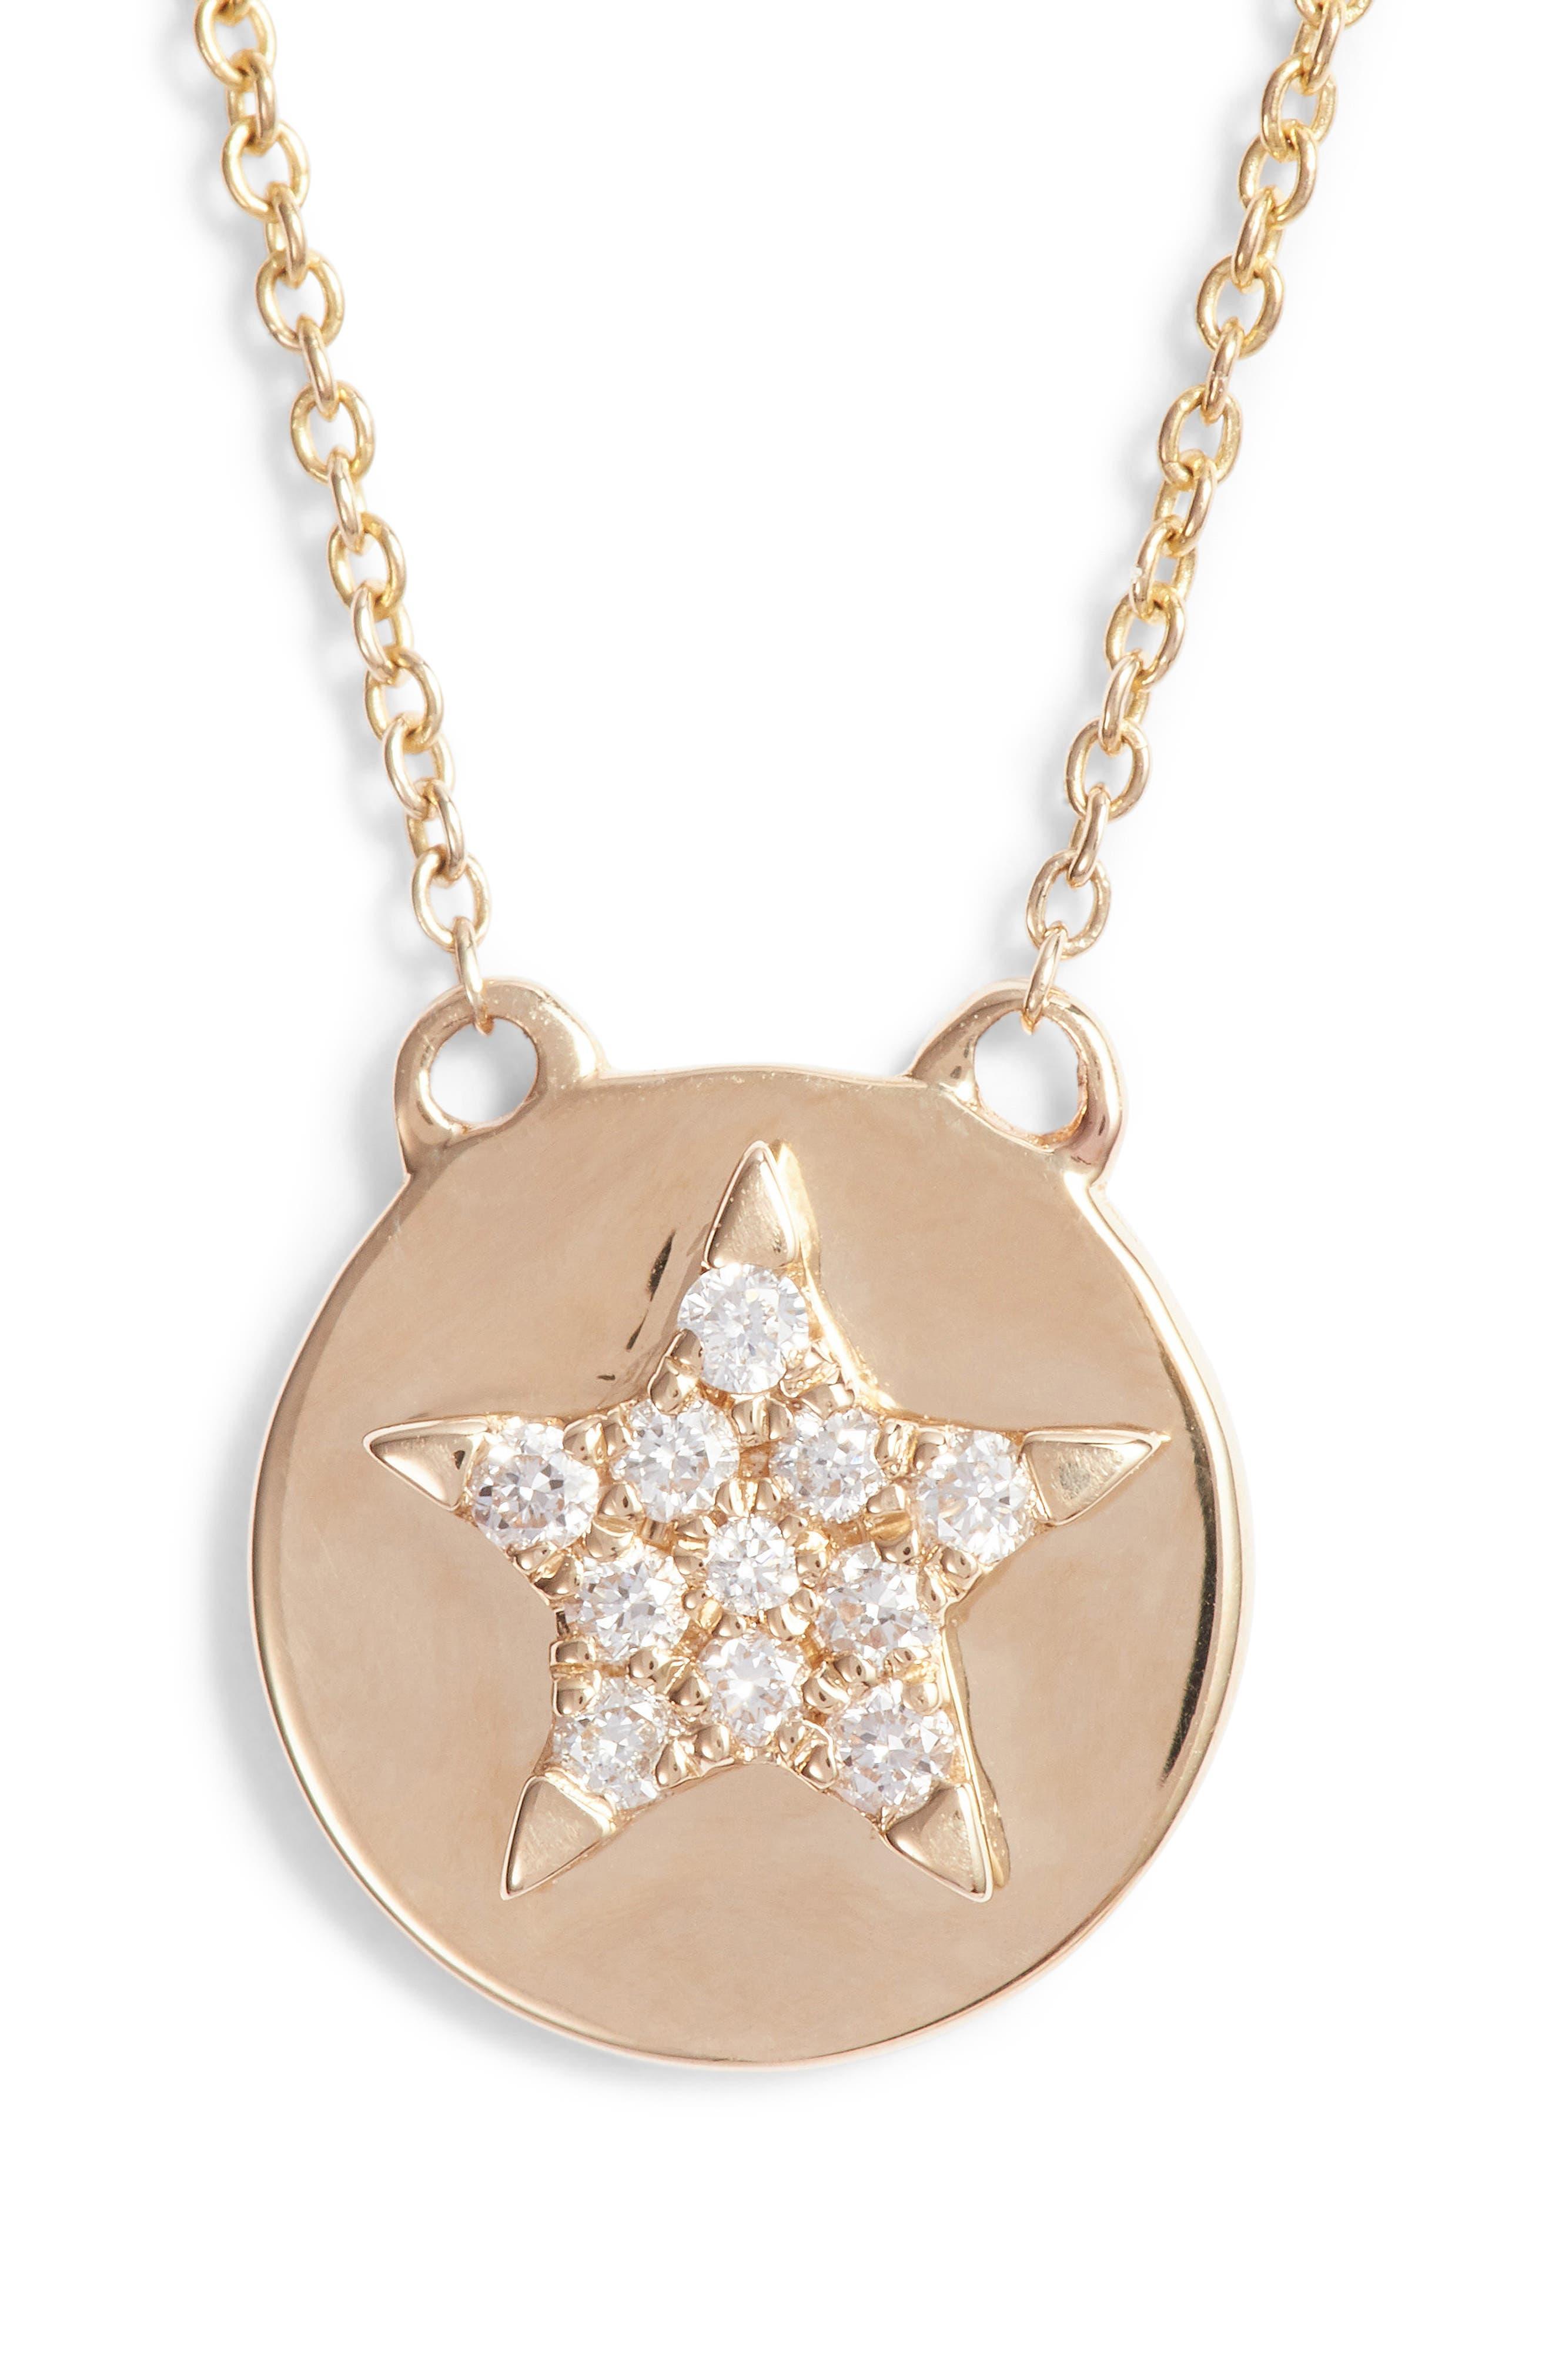 Dana Rebecca Designs Julianne Himiko Star Disc Pendant Necklace